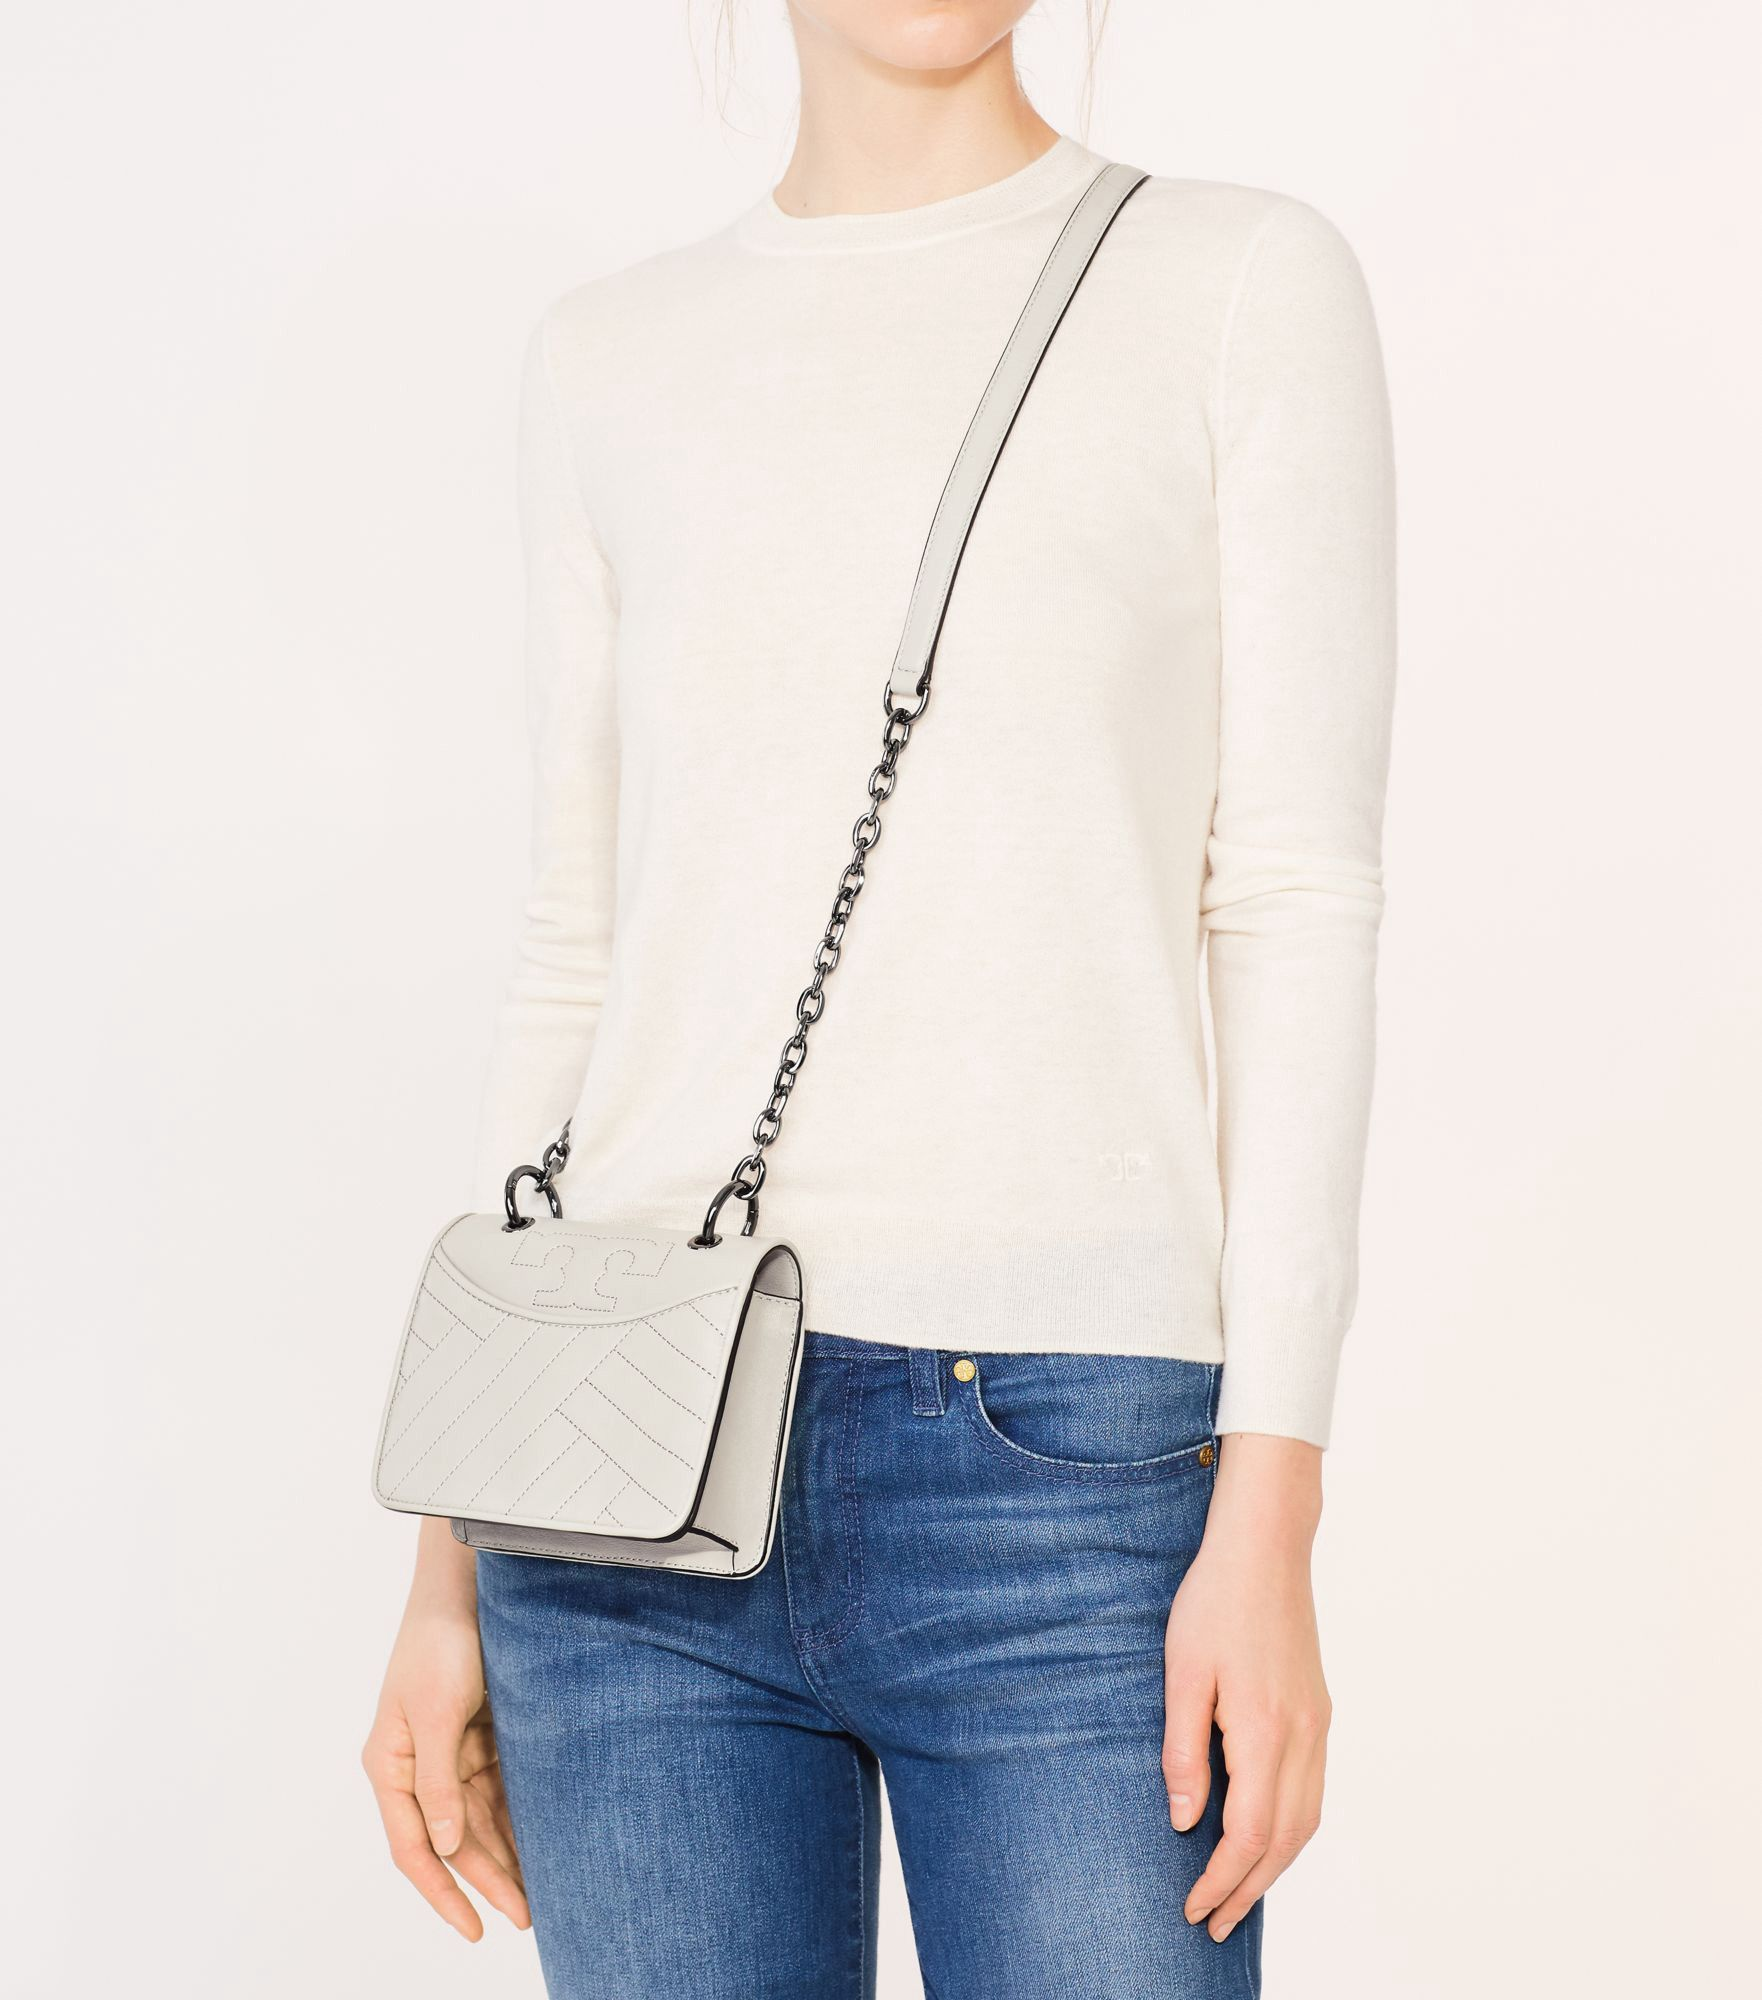 711905cc144 TORY BURCH ALEXA CONVERTIBLE MINI SHOULDER BAG.  toryburch  bags  shoulder  bags  leather